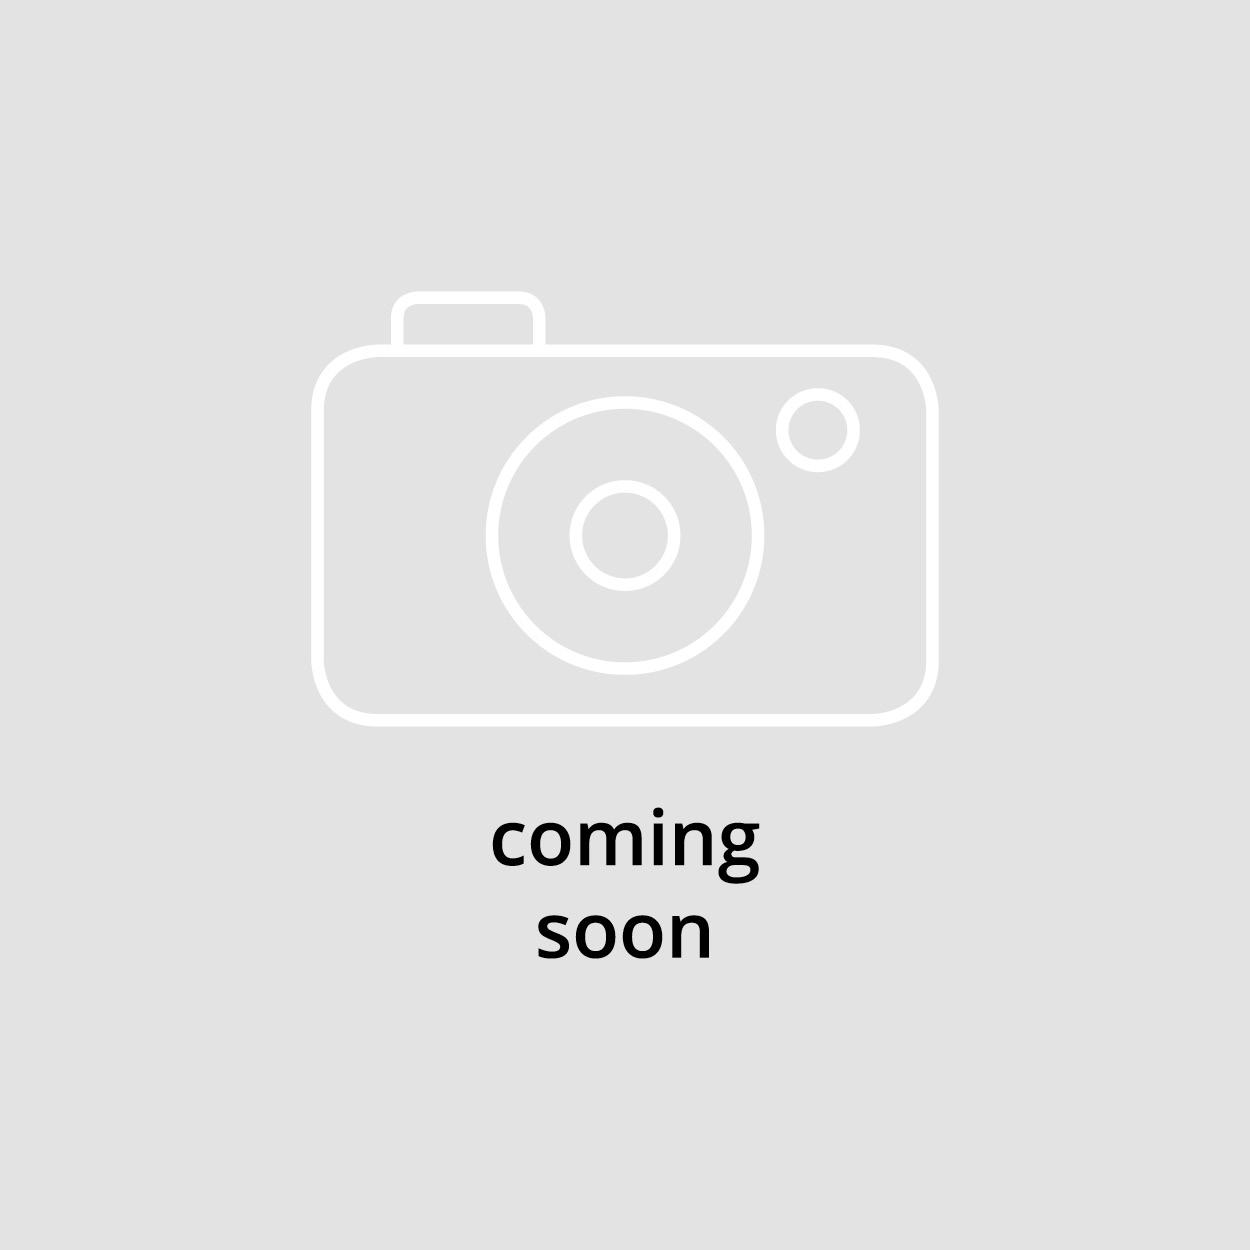 08.01.010 Ghiera per tamburo porta mandrini per Gildemeister  AS16, AS20, GS20, GM20, GM20AC